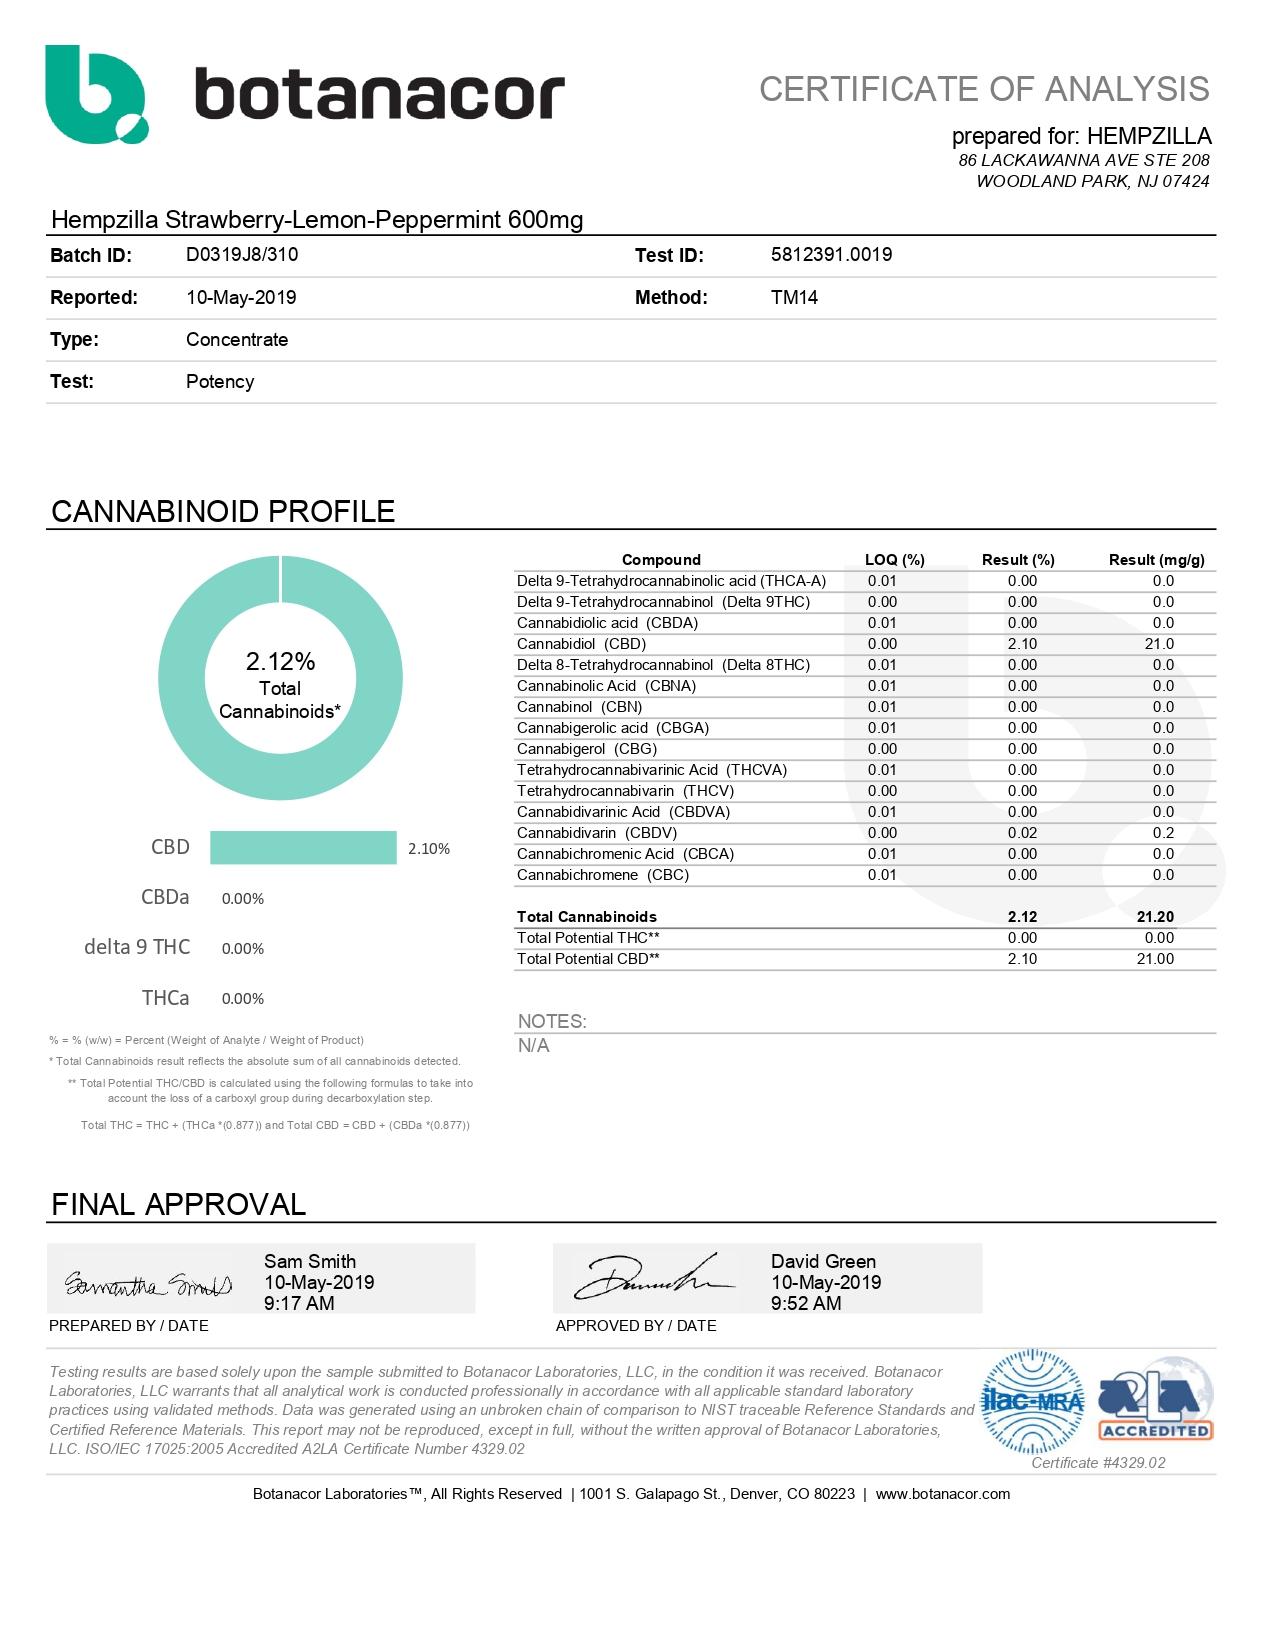 Hempzilla CBD Tincture Lemon Berry Mint 600mg Lab Report